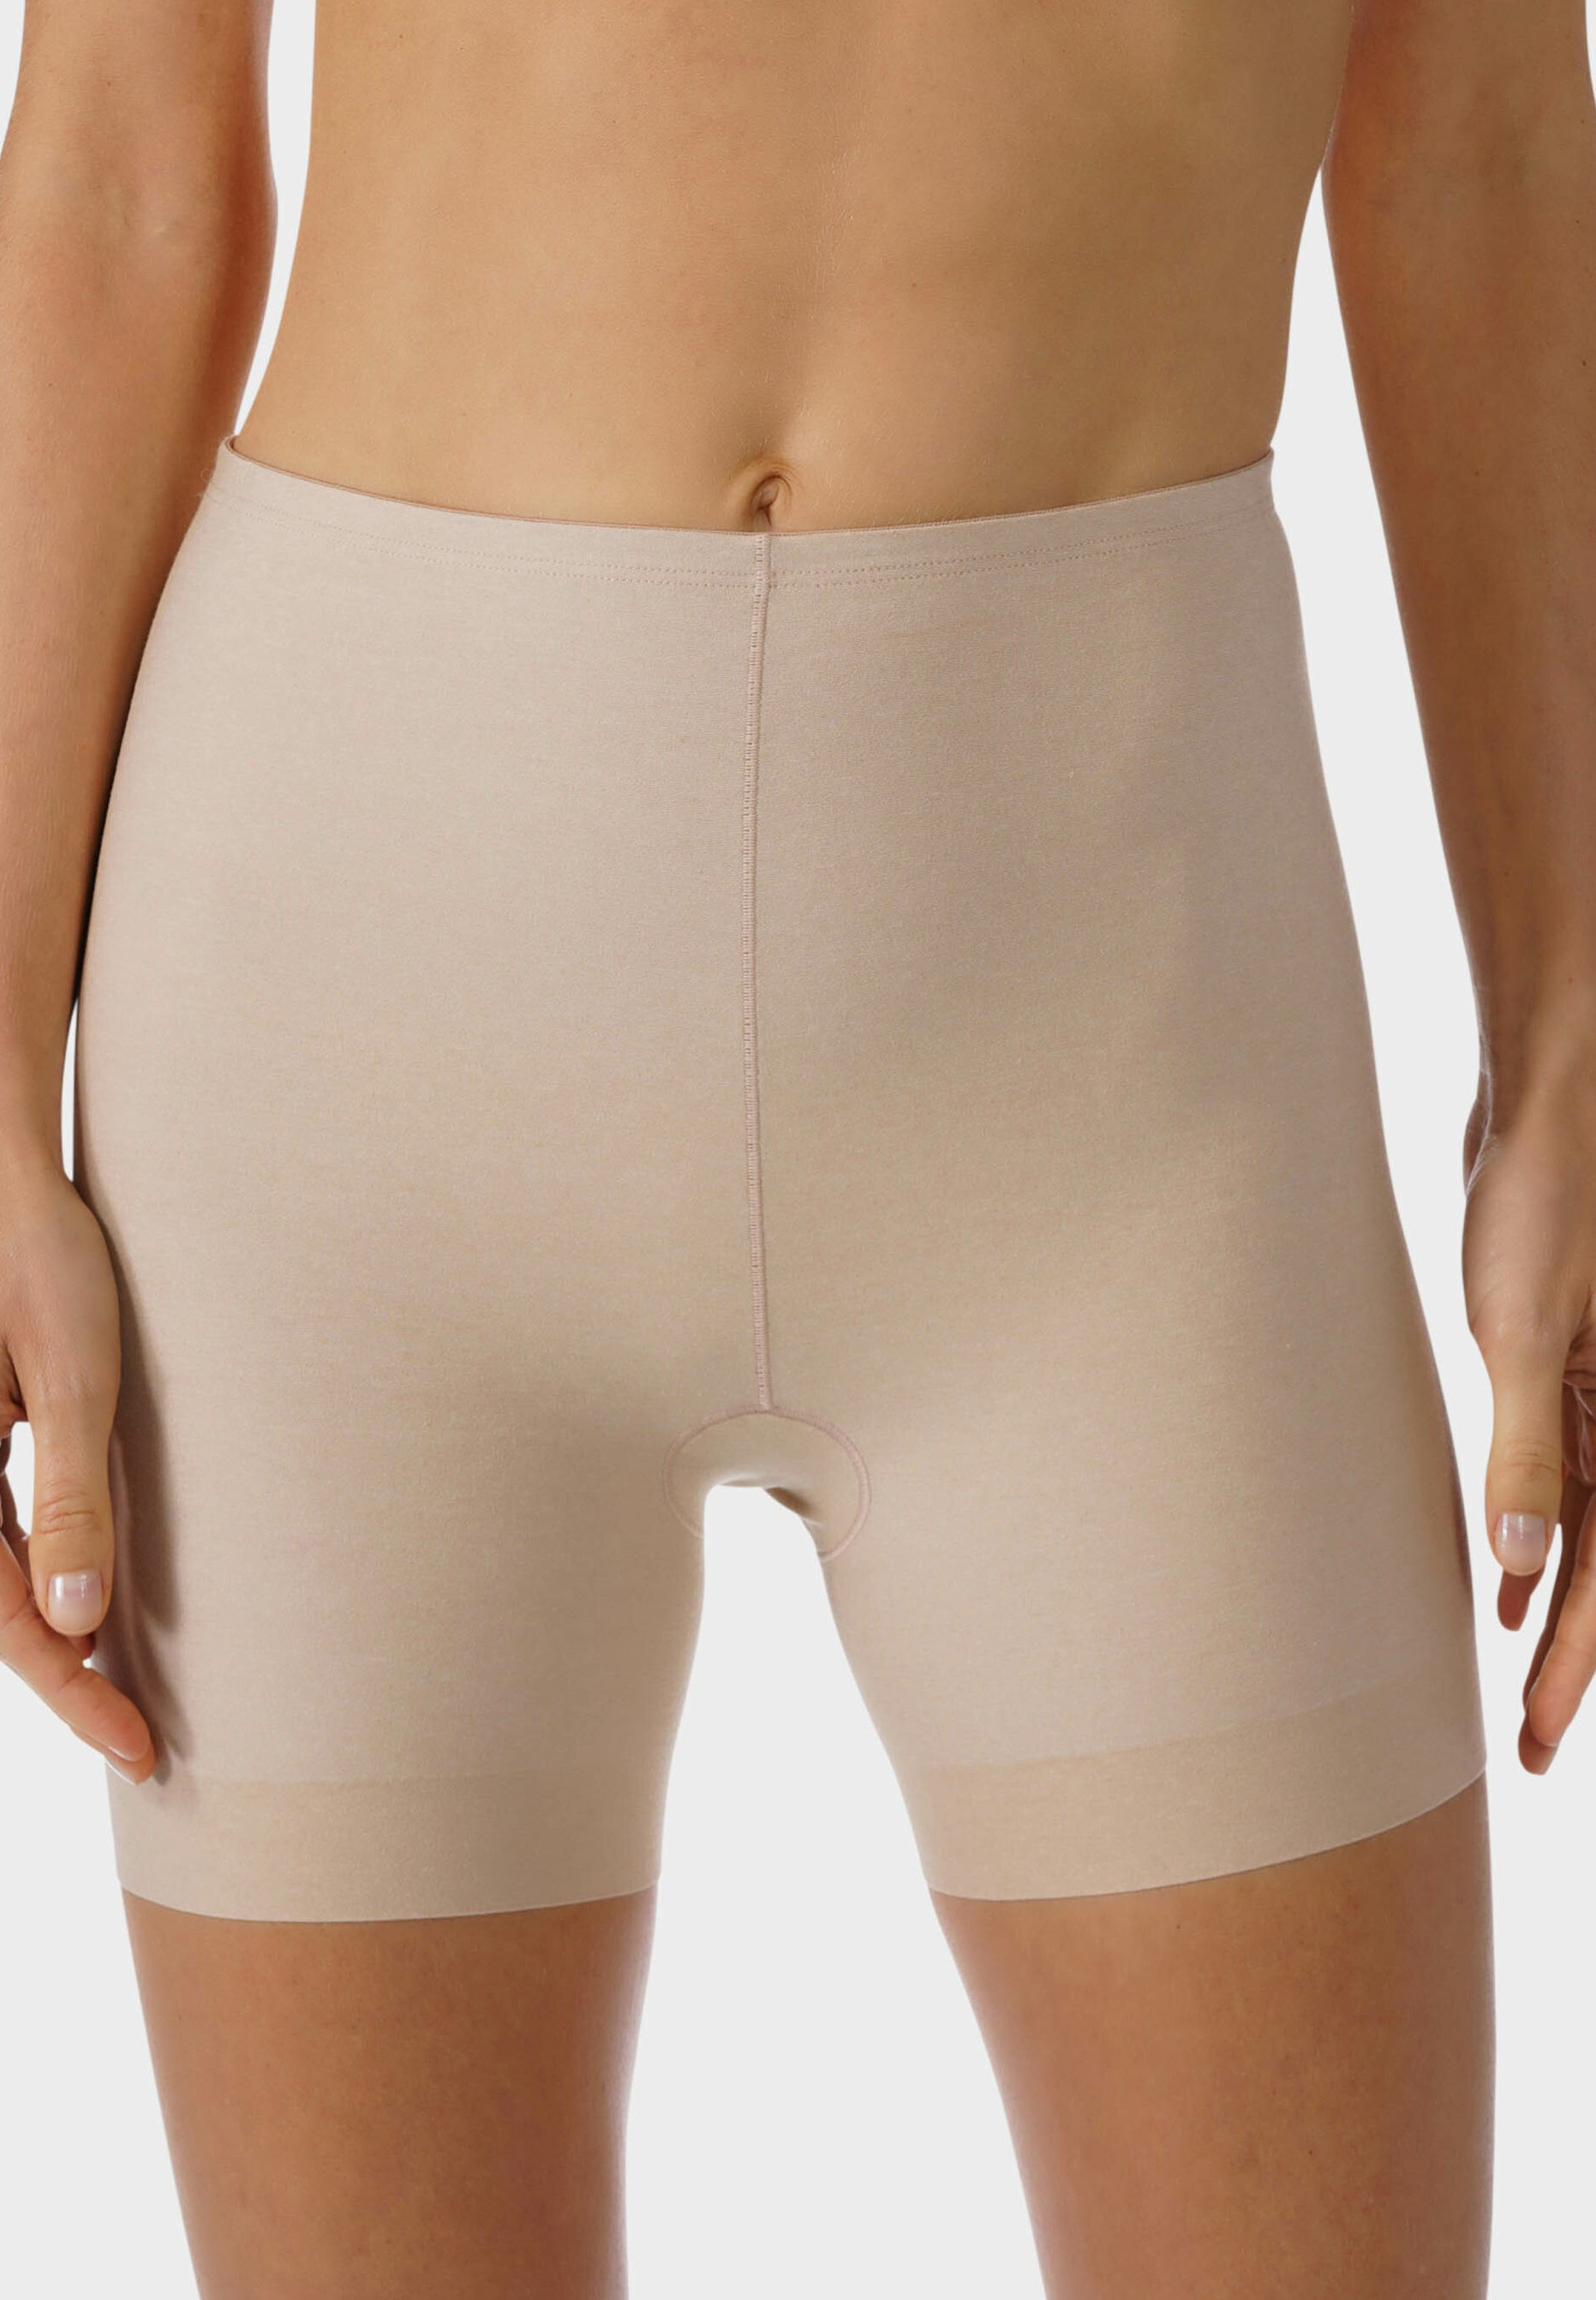 Damen SHORTS SERIE NOVA - Panties